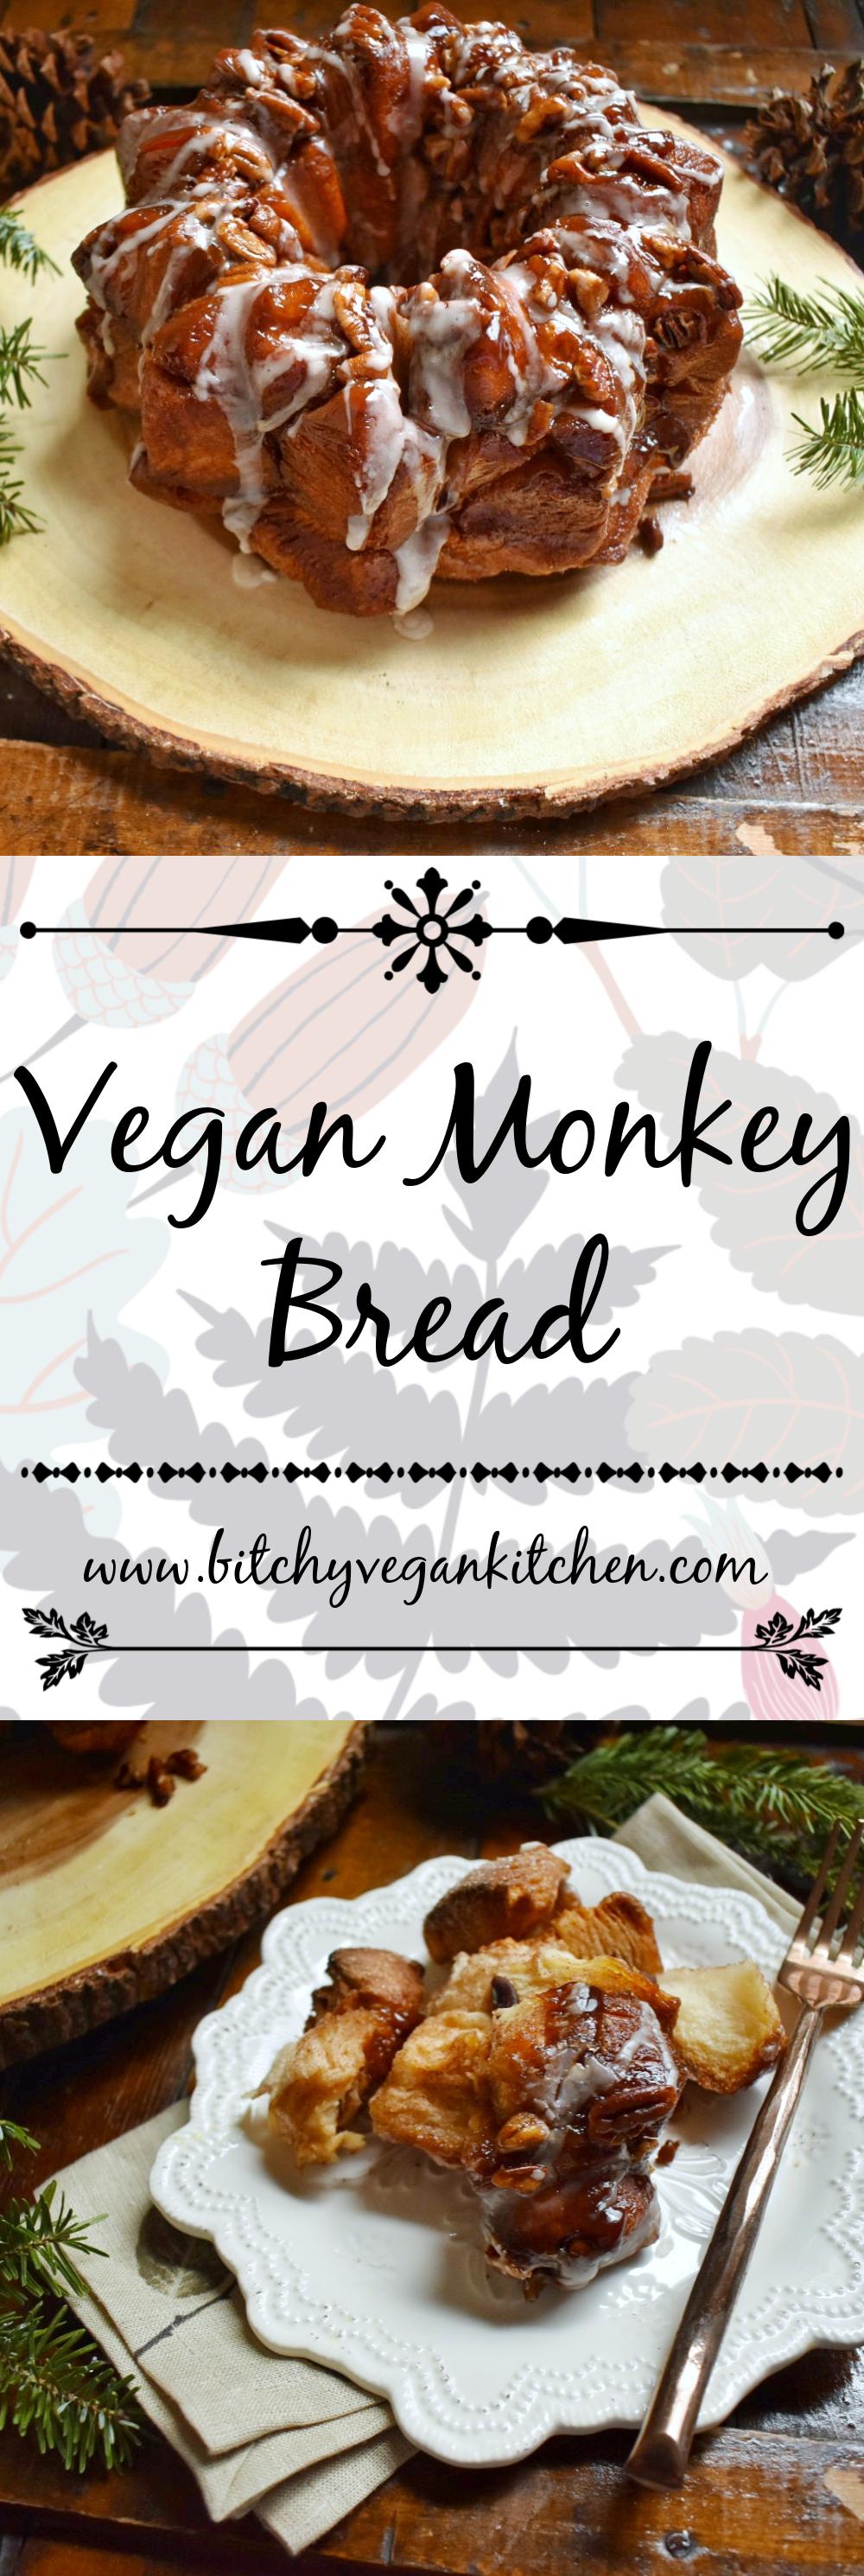 Vegan Monkey Bread - The Bitchy Baker